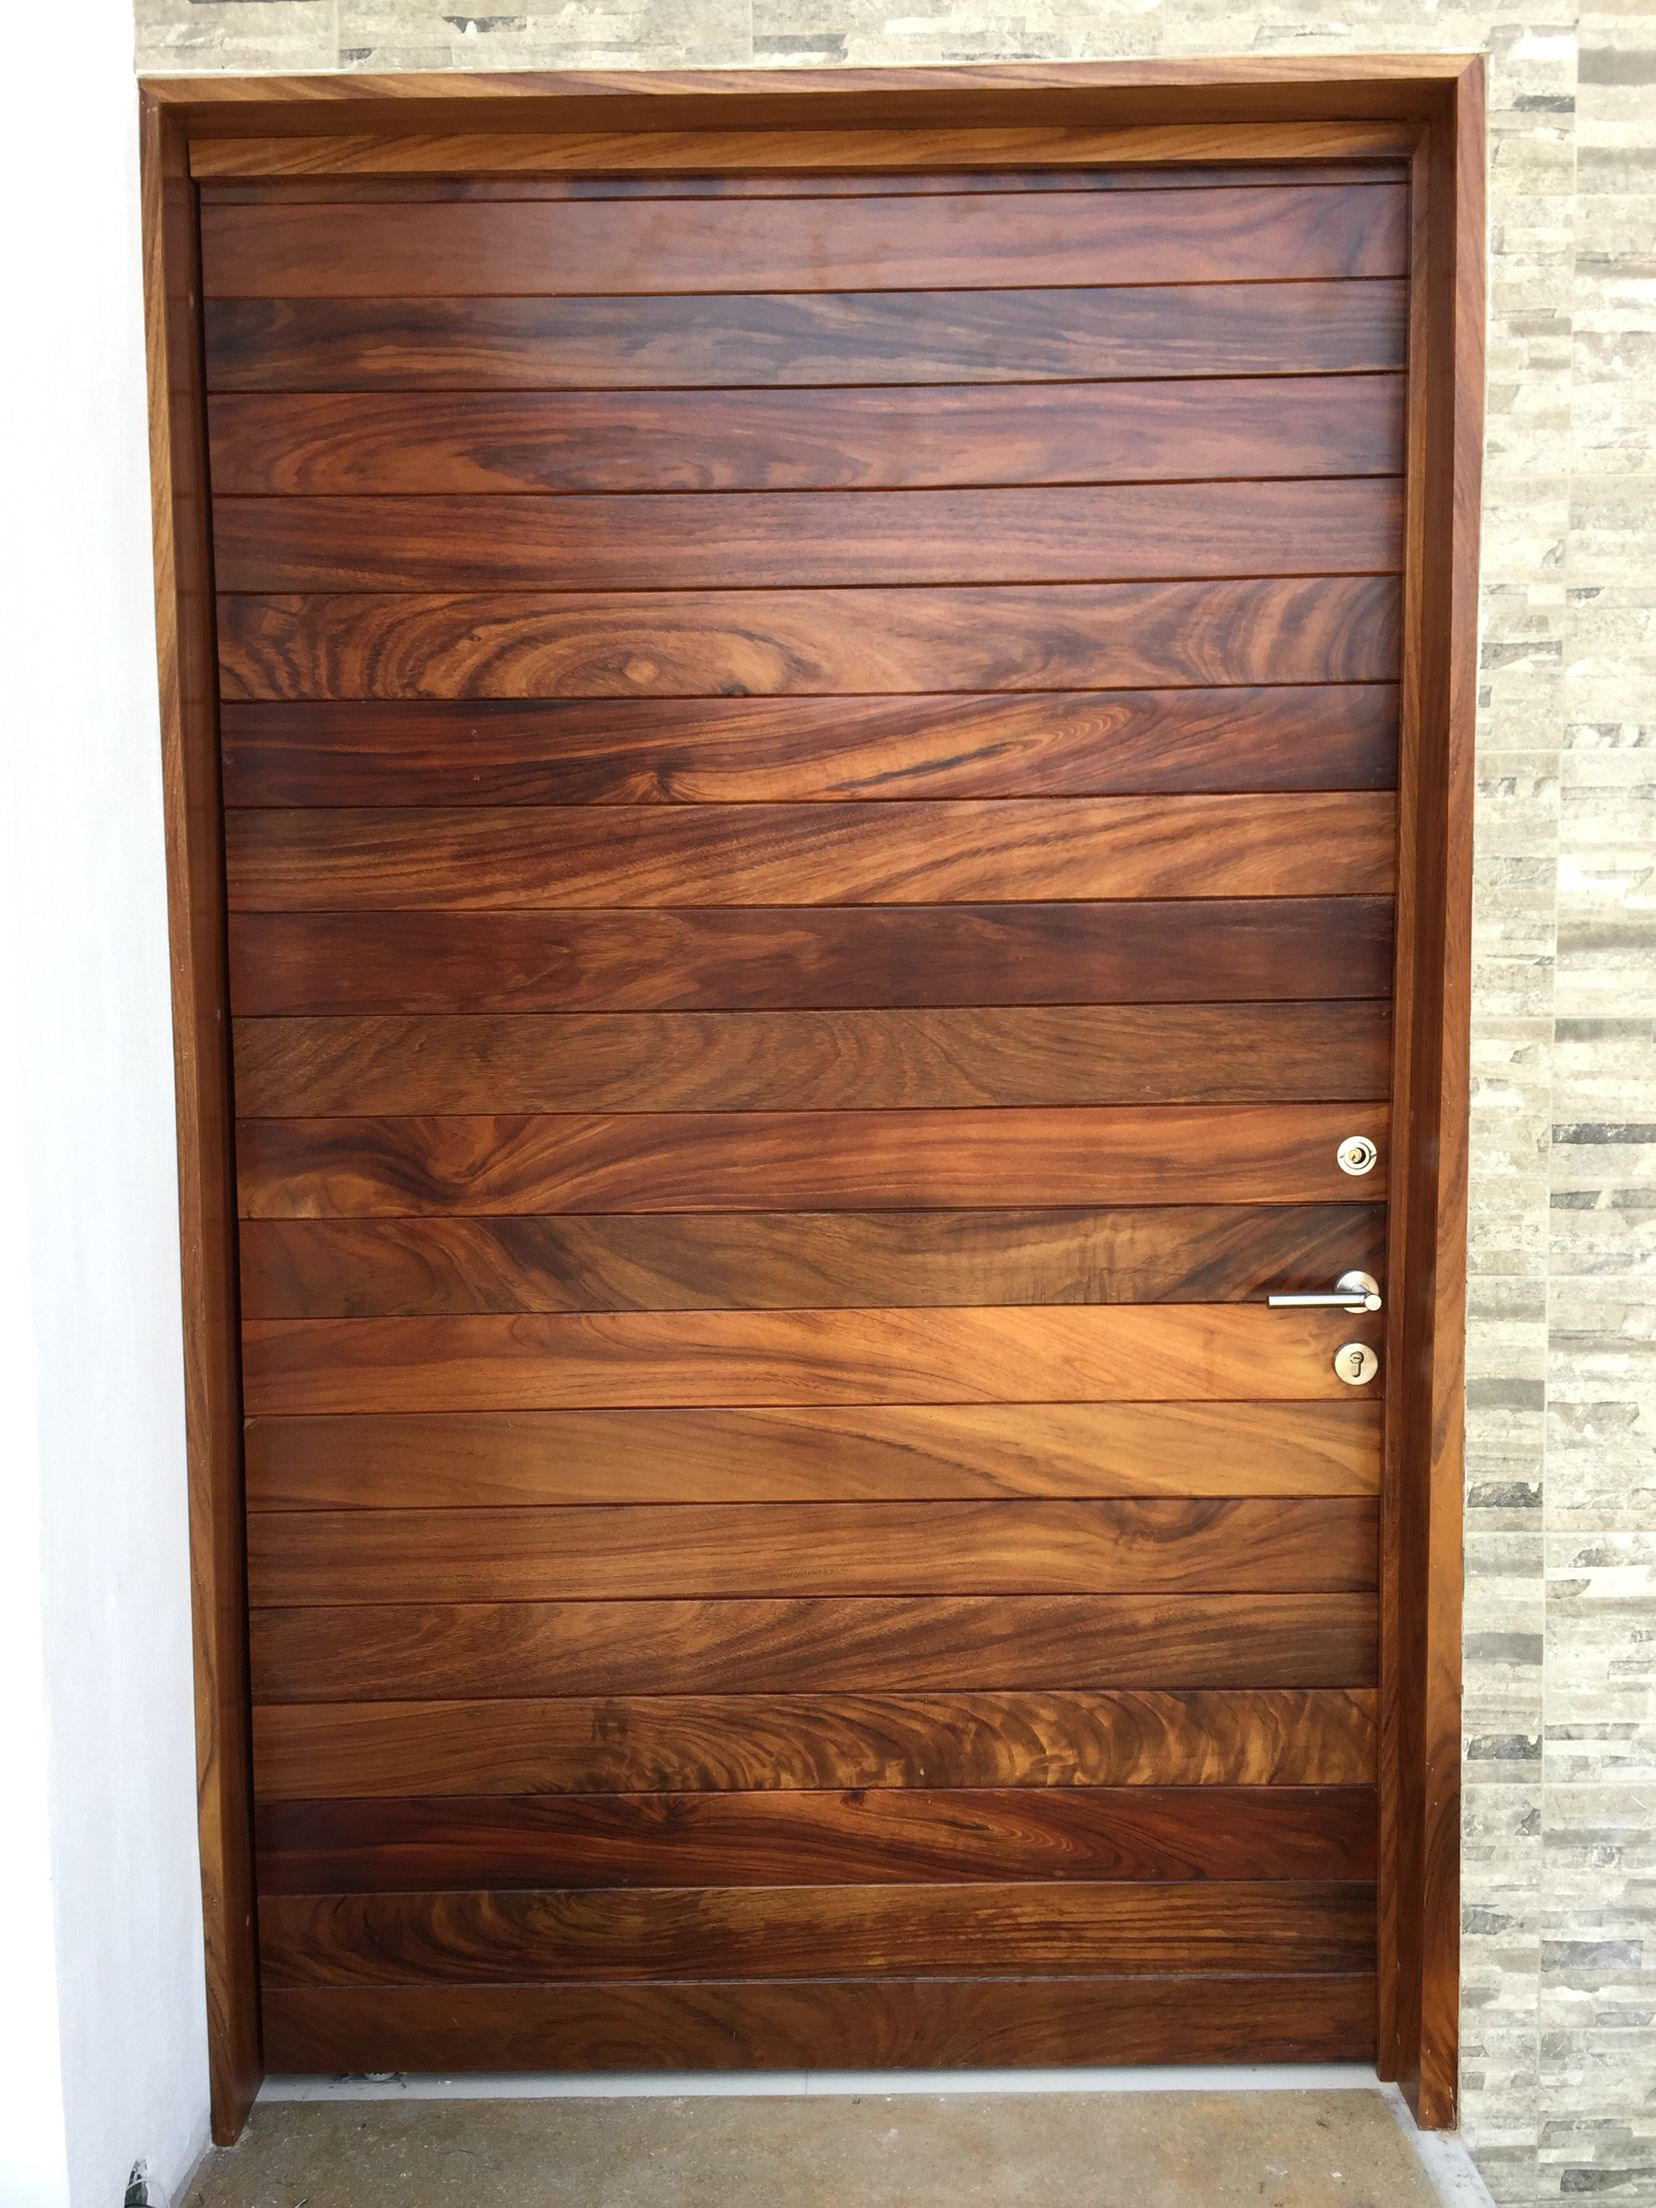 Puerta principal en madera dé parota (huanacaxtle) http://paginas ...